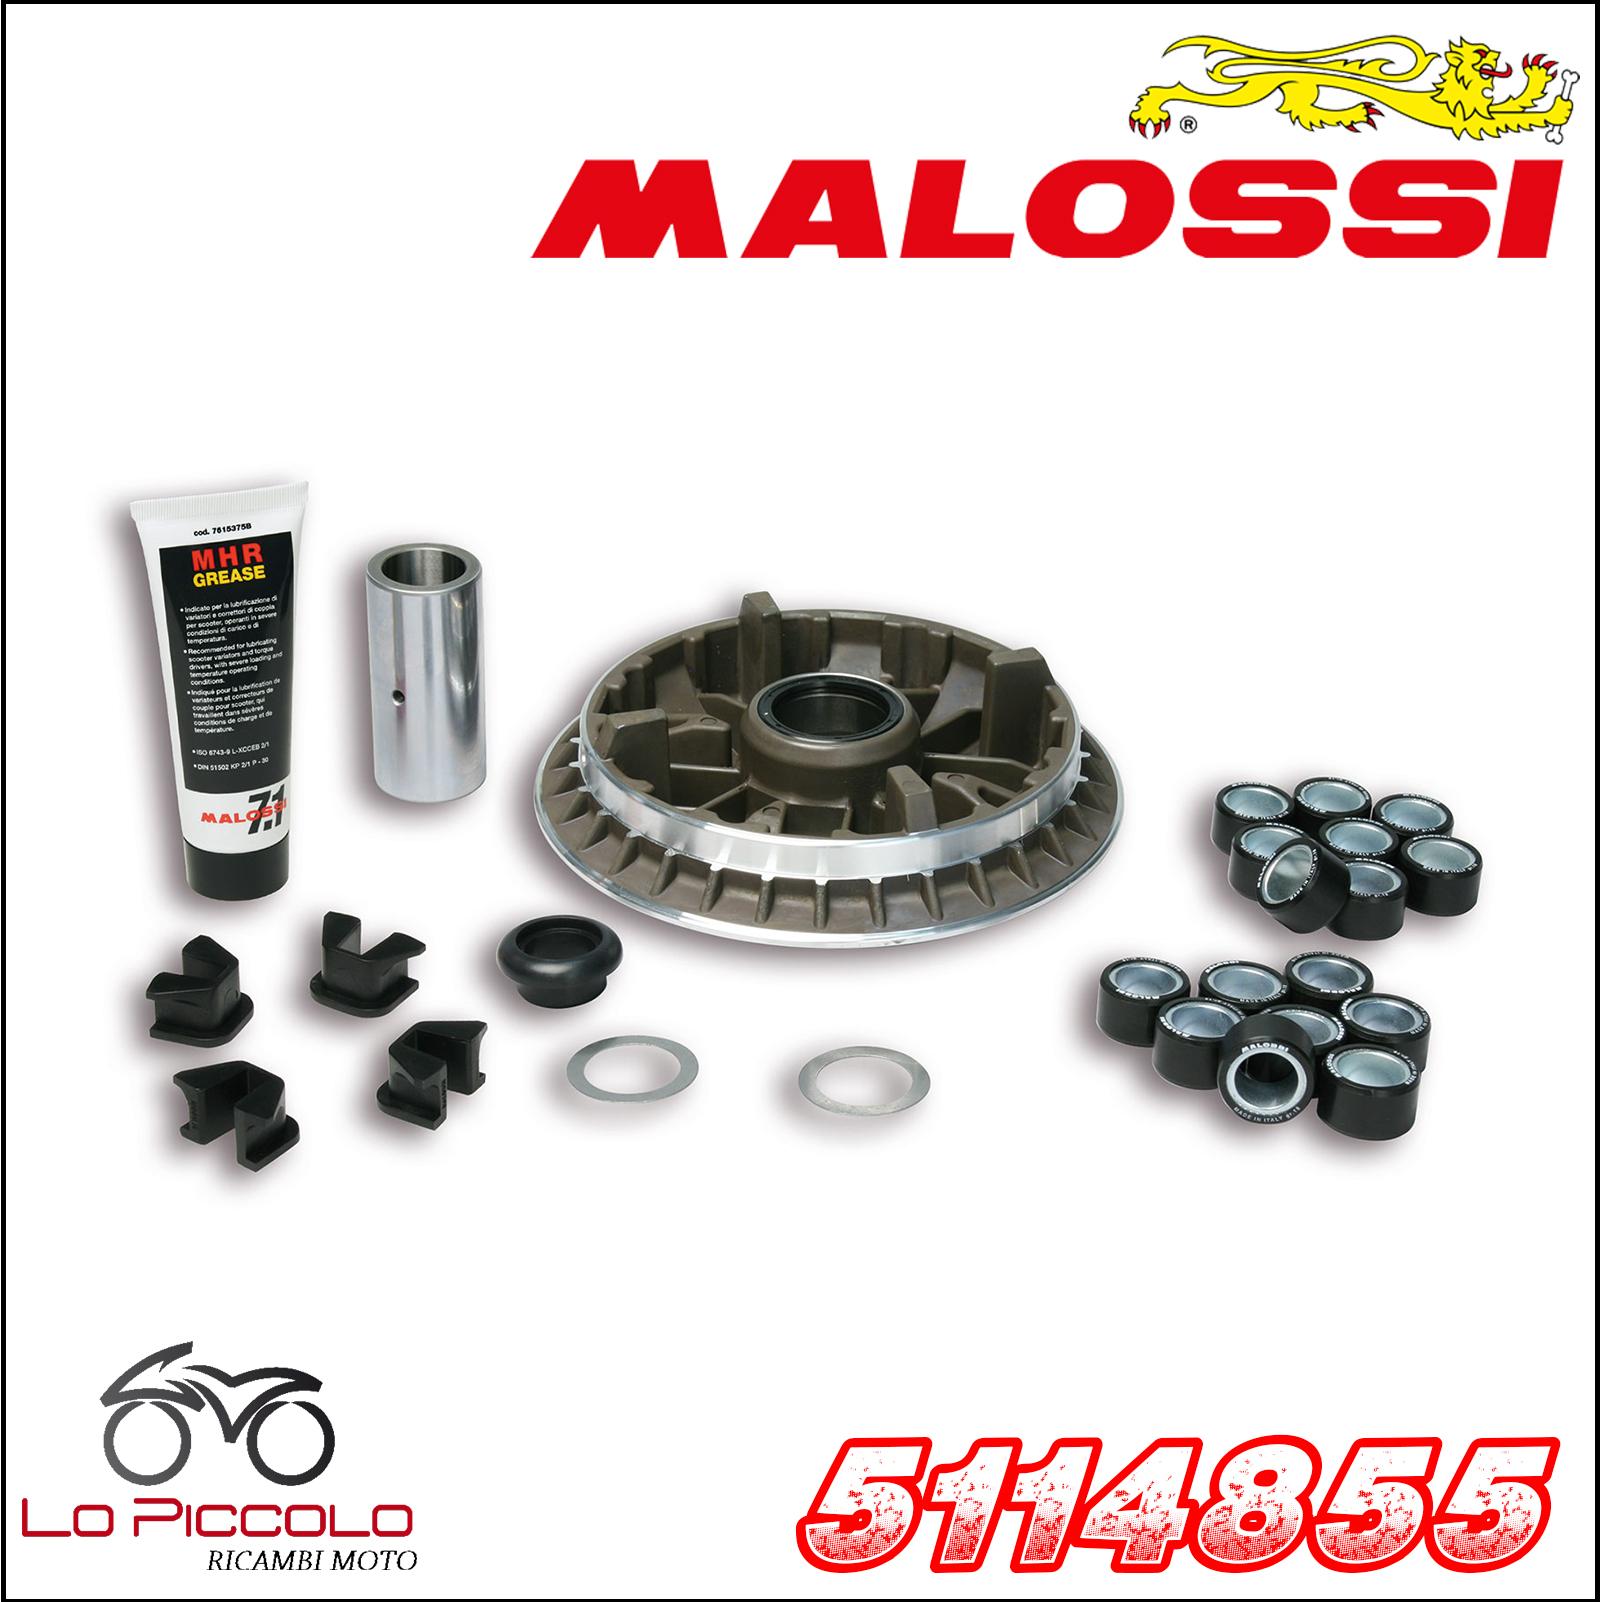 5114855 variatore malossi multivar 2000 mhr yamaha t max t. Black Bedroom Furniture Sets. Home Design Ideas